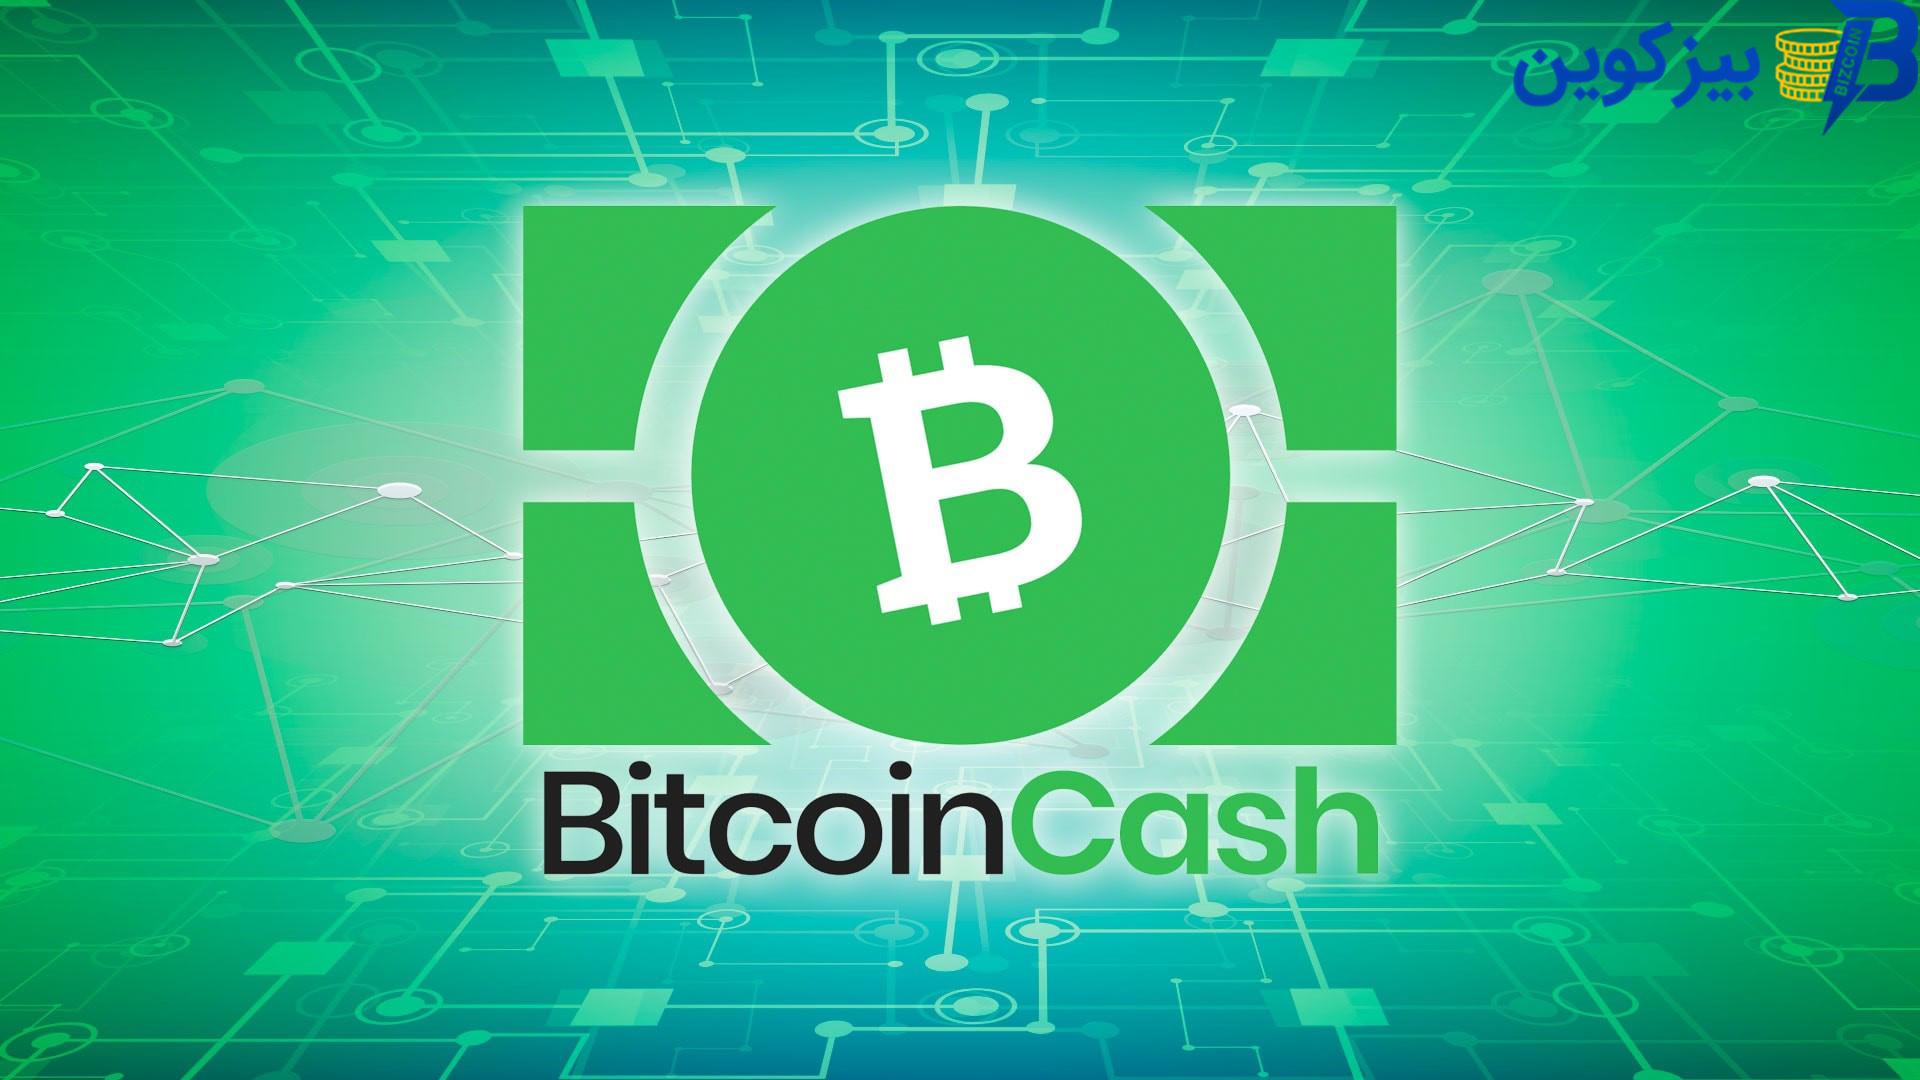 buy bitcoin cash 3 بررسی آسان ترین روش خرید بیت کوین کش